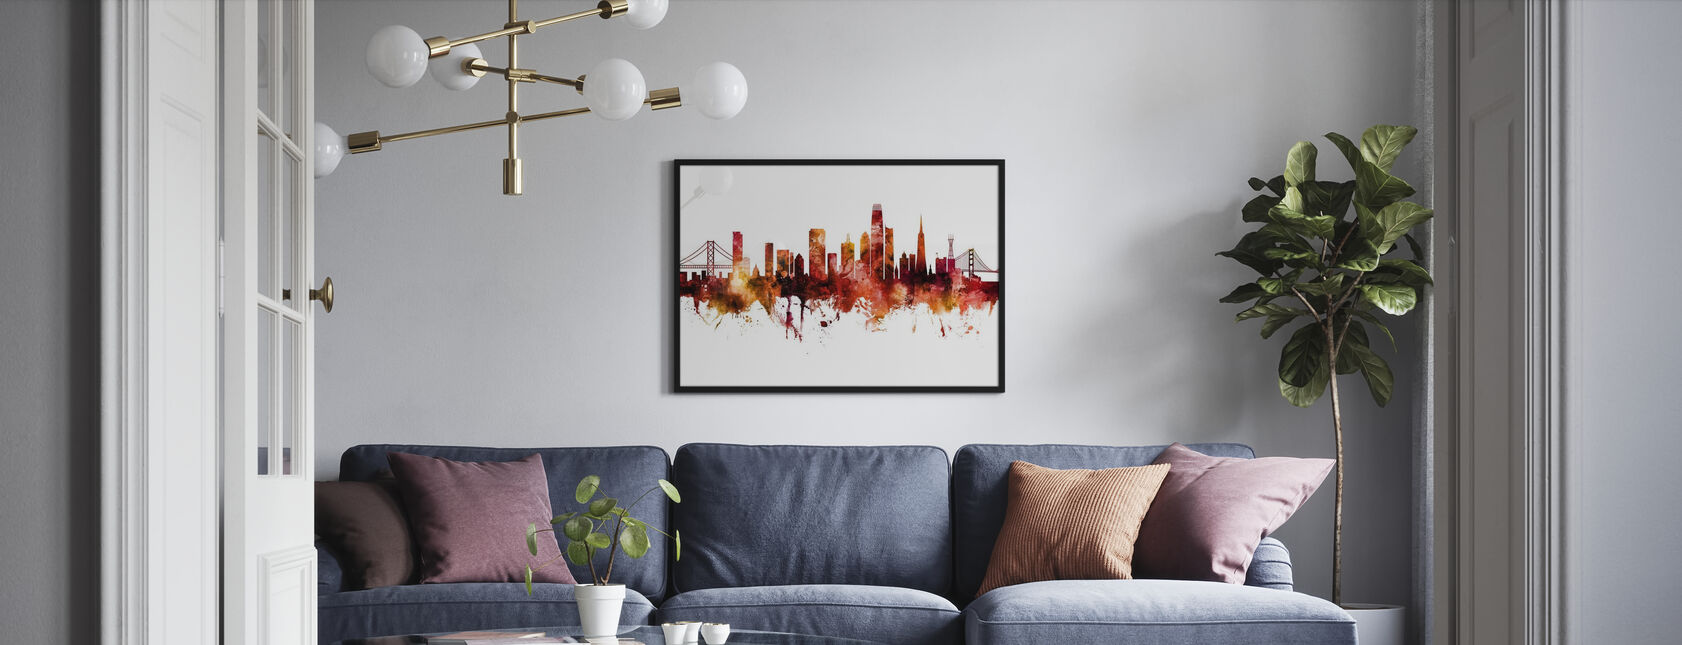 Skyline van San Francisco Californië - Poster - Woonkamer